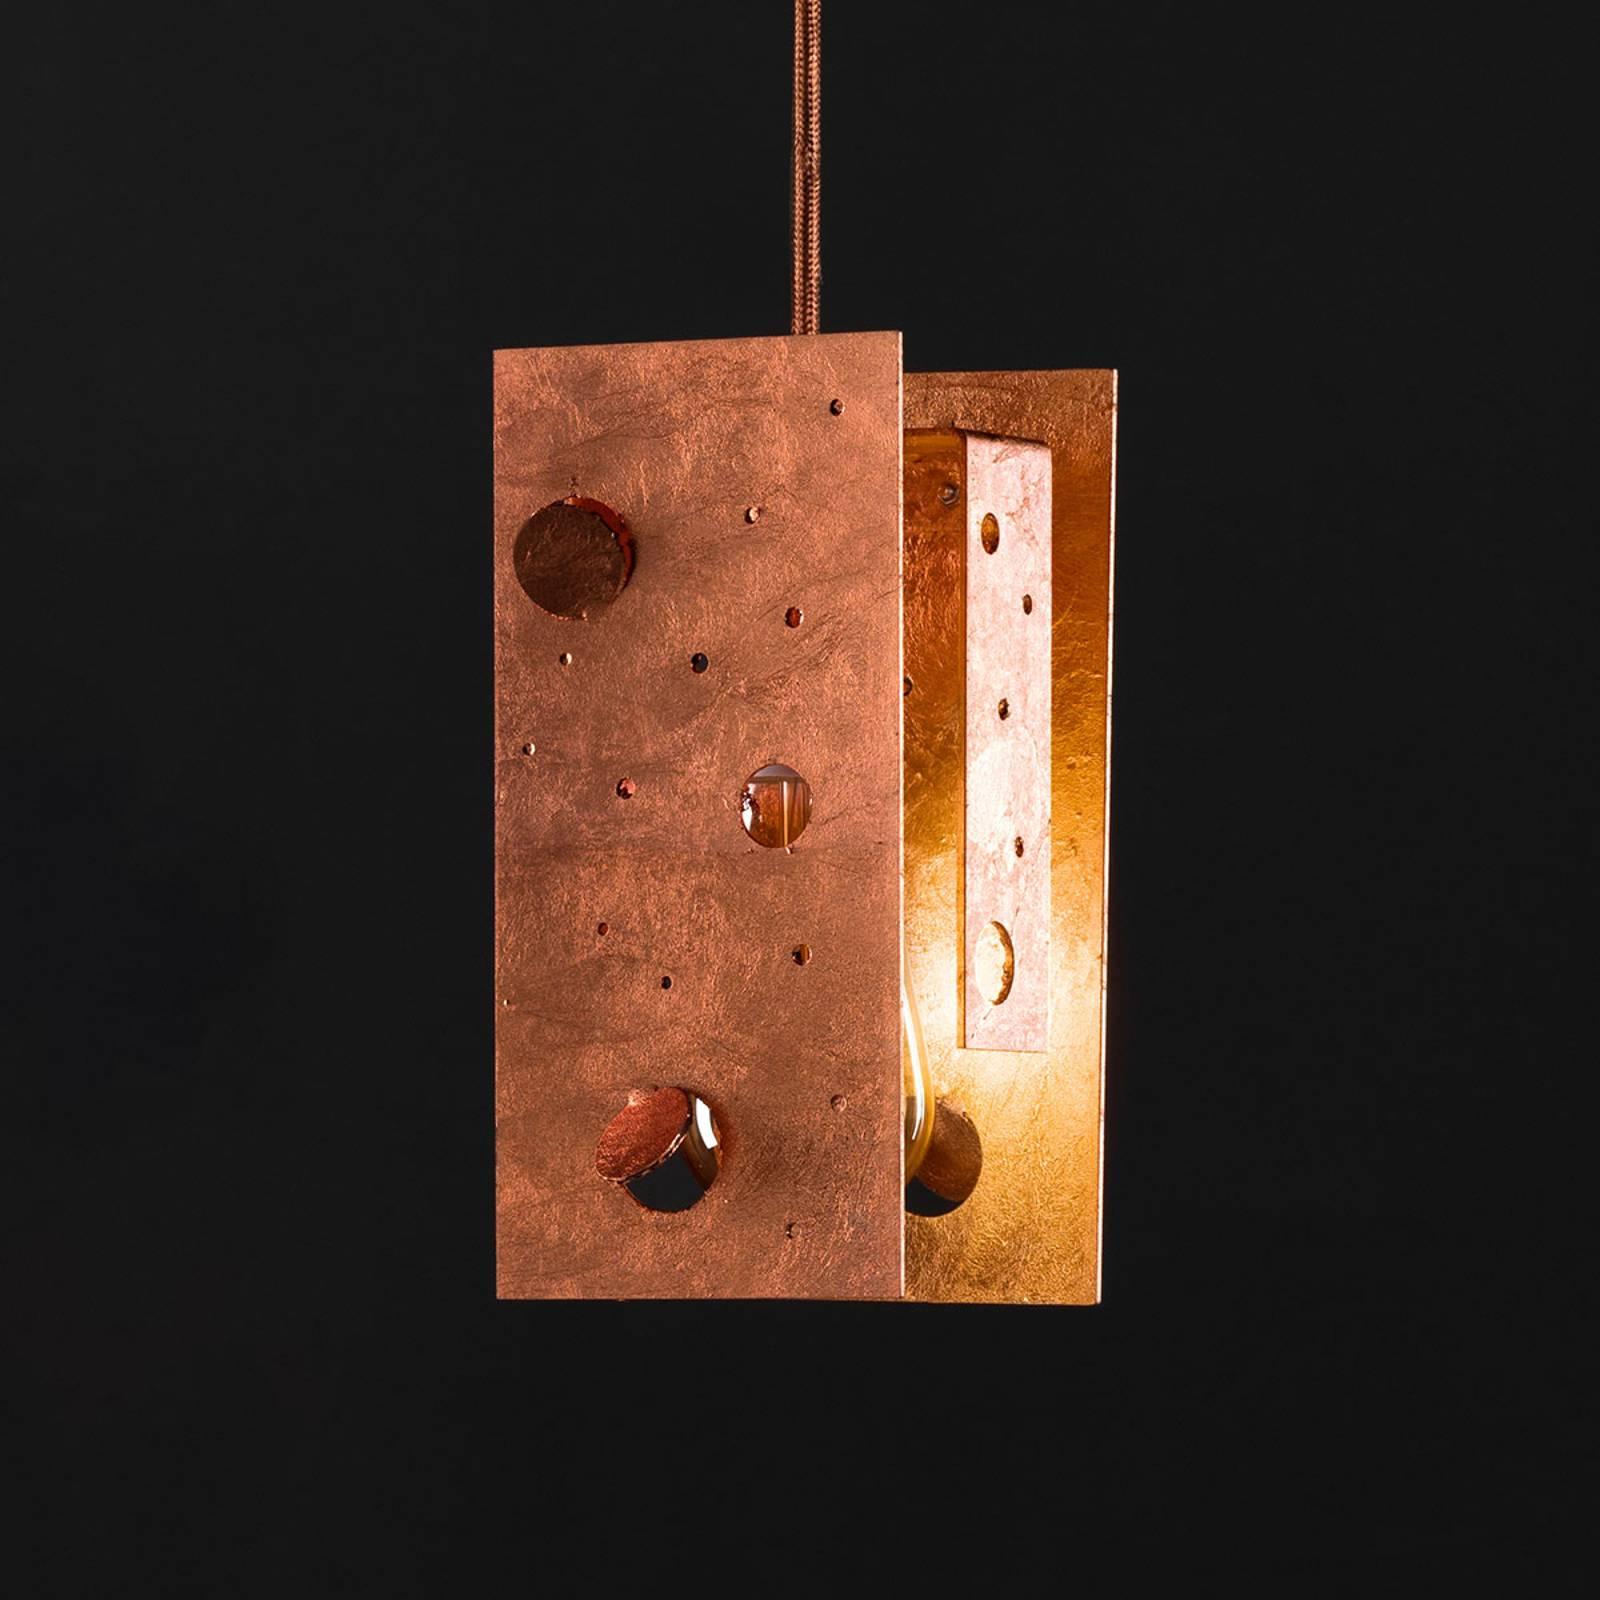 Knikerboker Buchi hanglamp 19x19x40cm koper